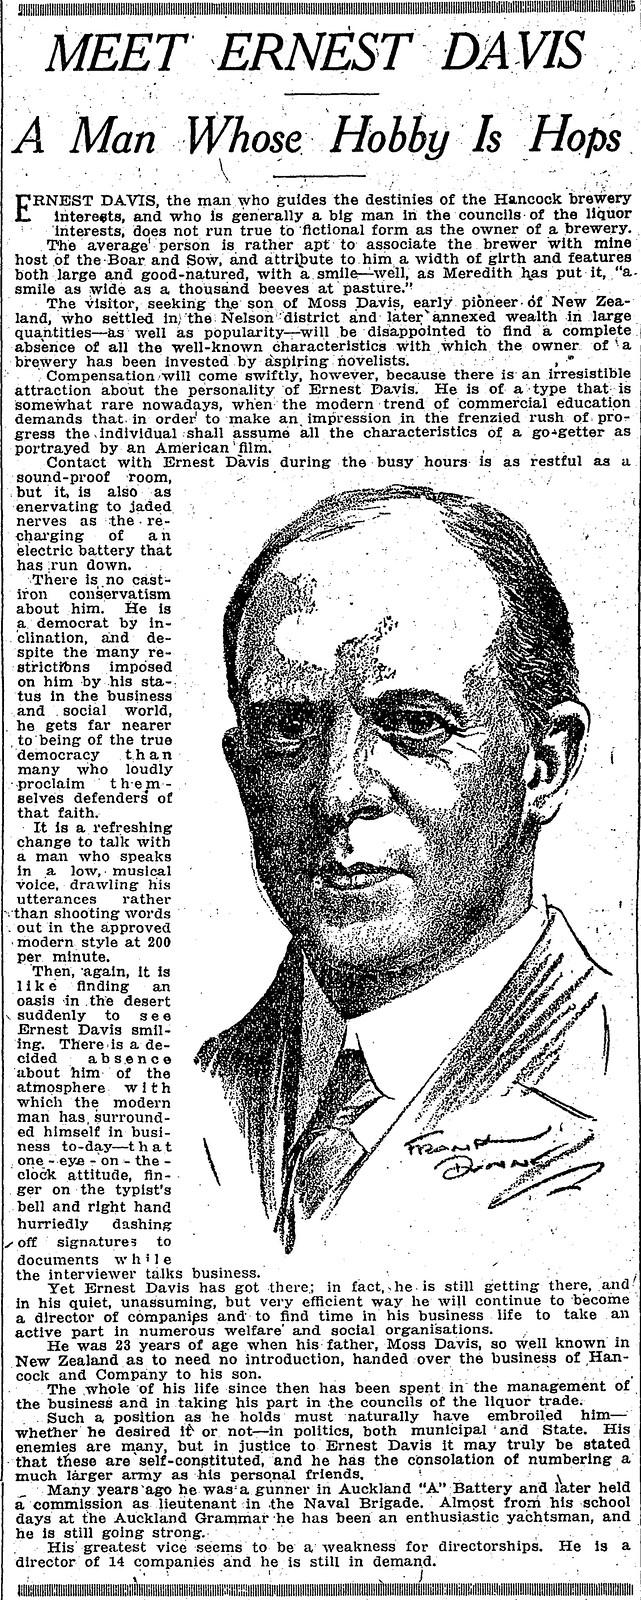 Ernest-Davis-newspaper